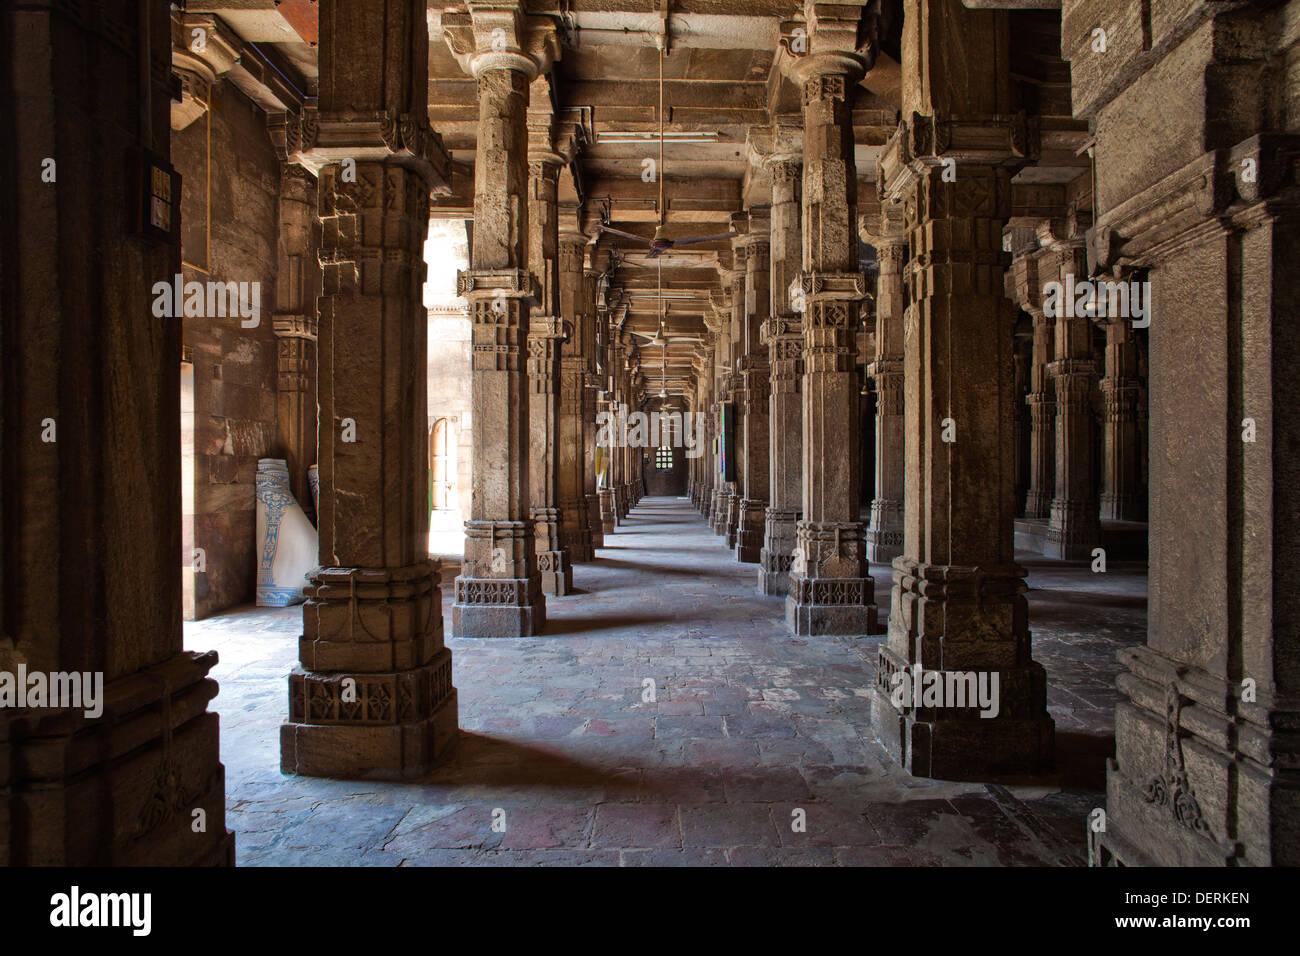 Interiors of a mosque, Jhulta Minara, Ahmedabad, Gujarat, India Stock Photo